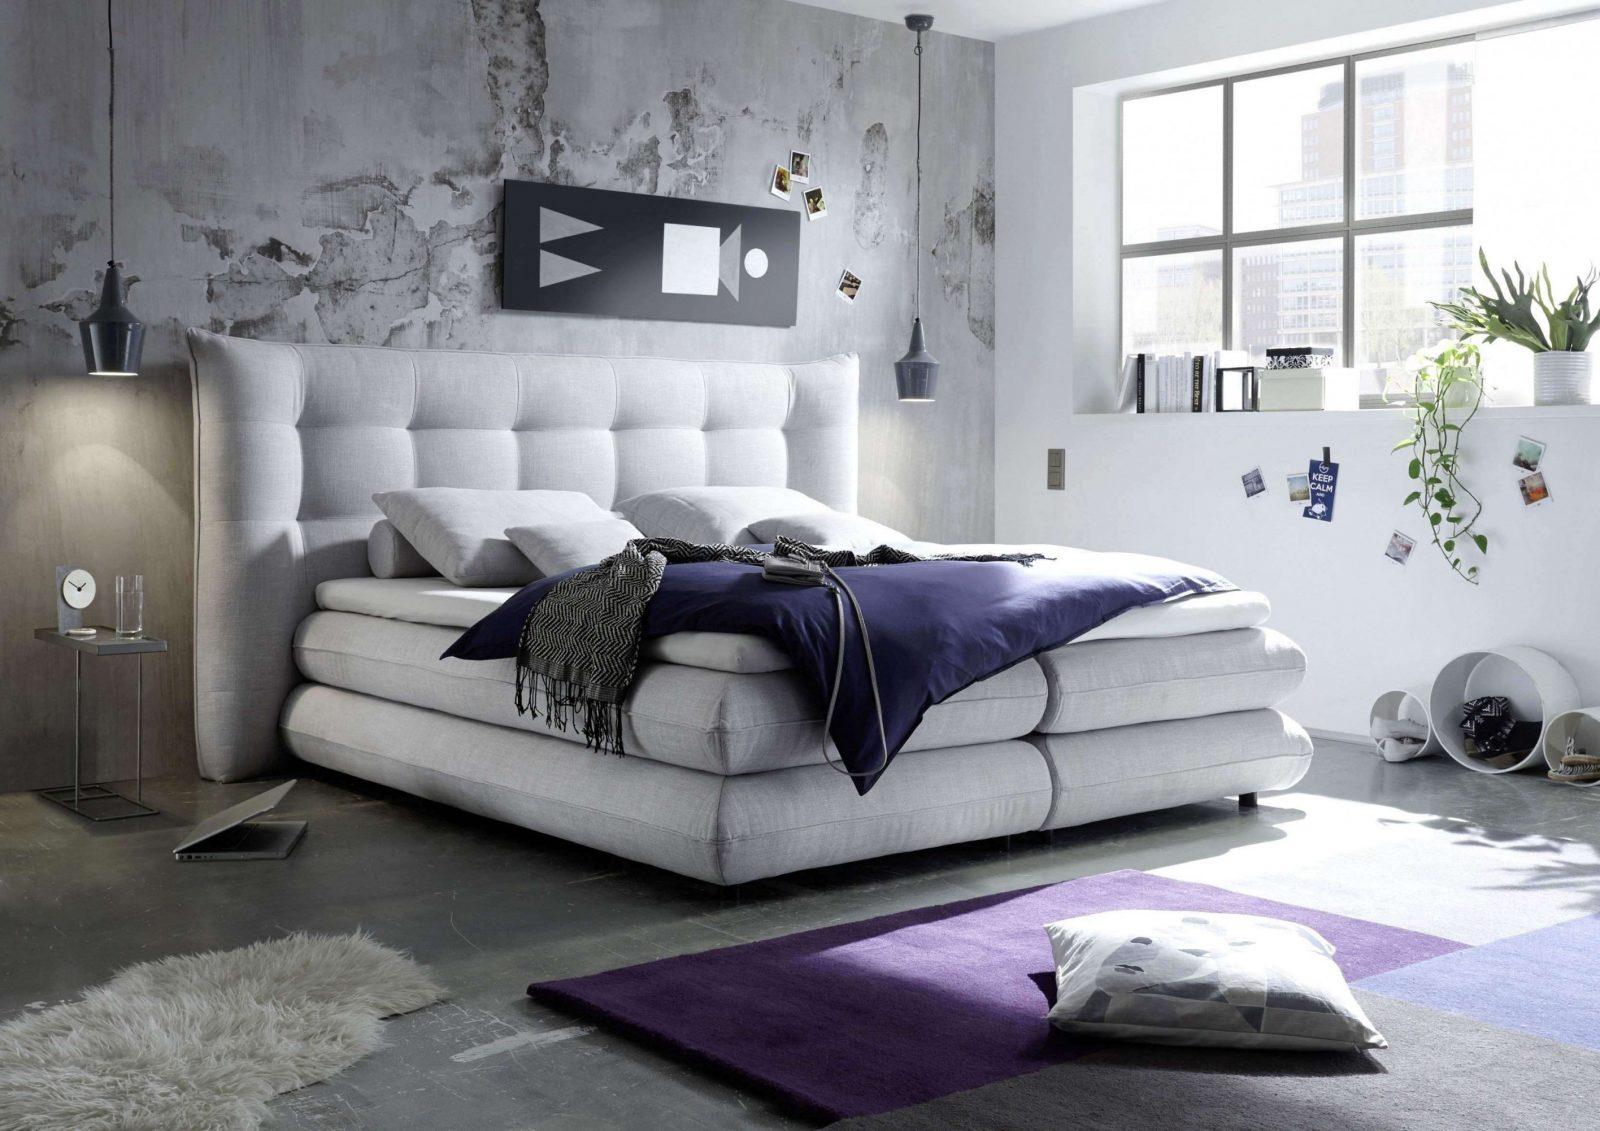 Luxus Komplett Schlafzimmer Boxspringbett Designideen  All von Schlafzimmer Boxspringbett Ideen Bild